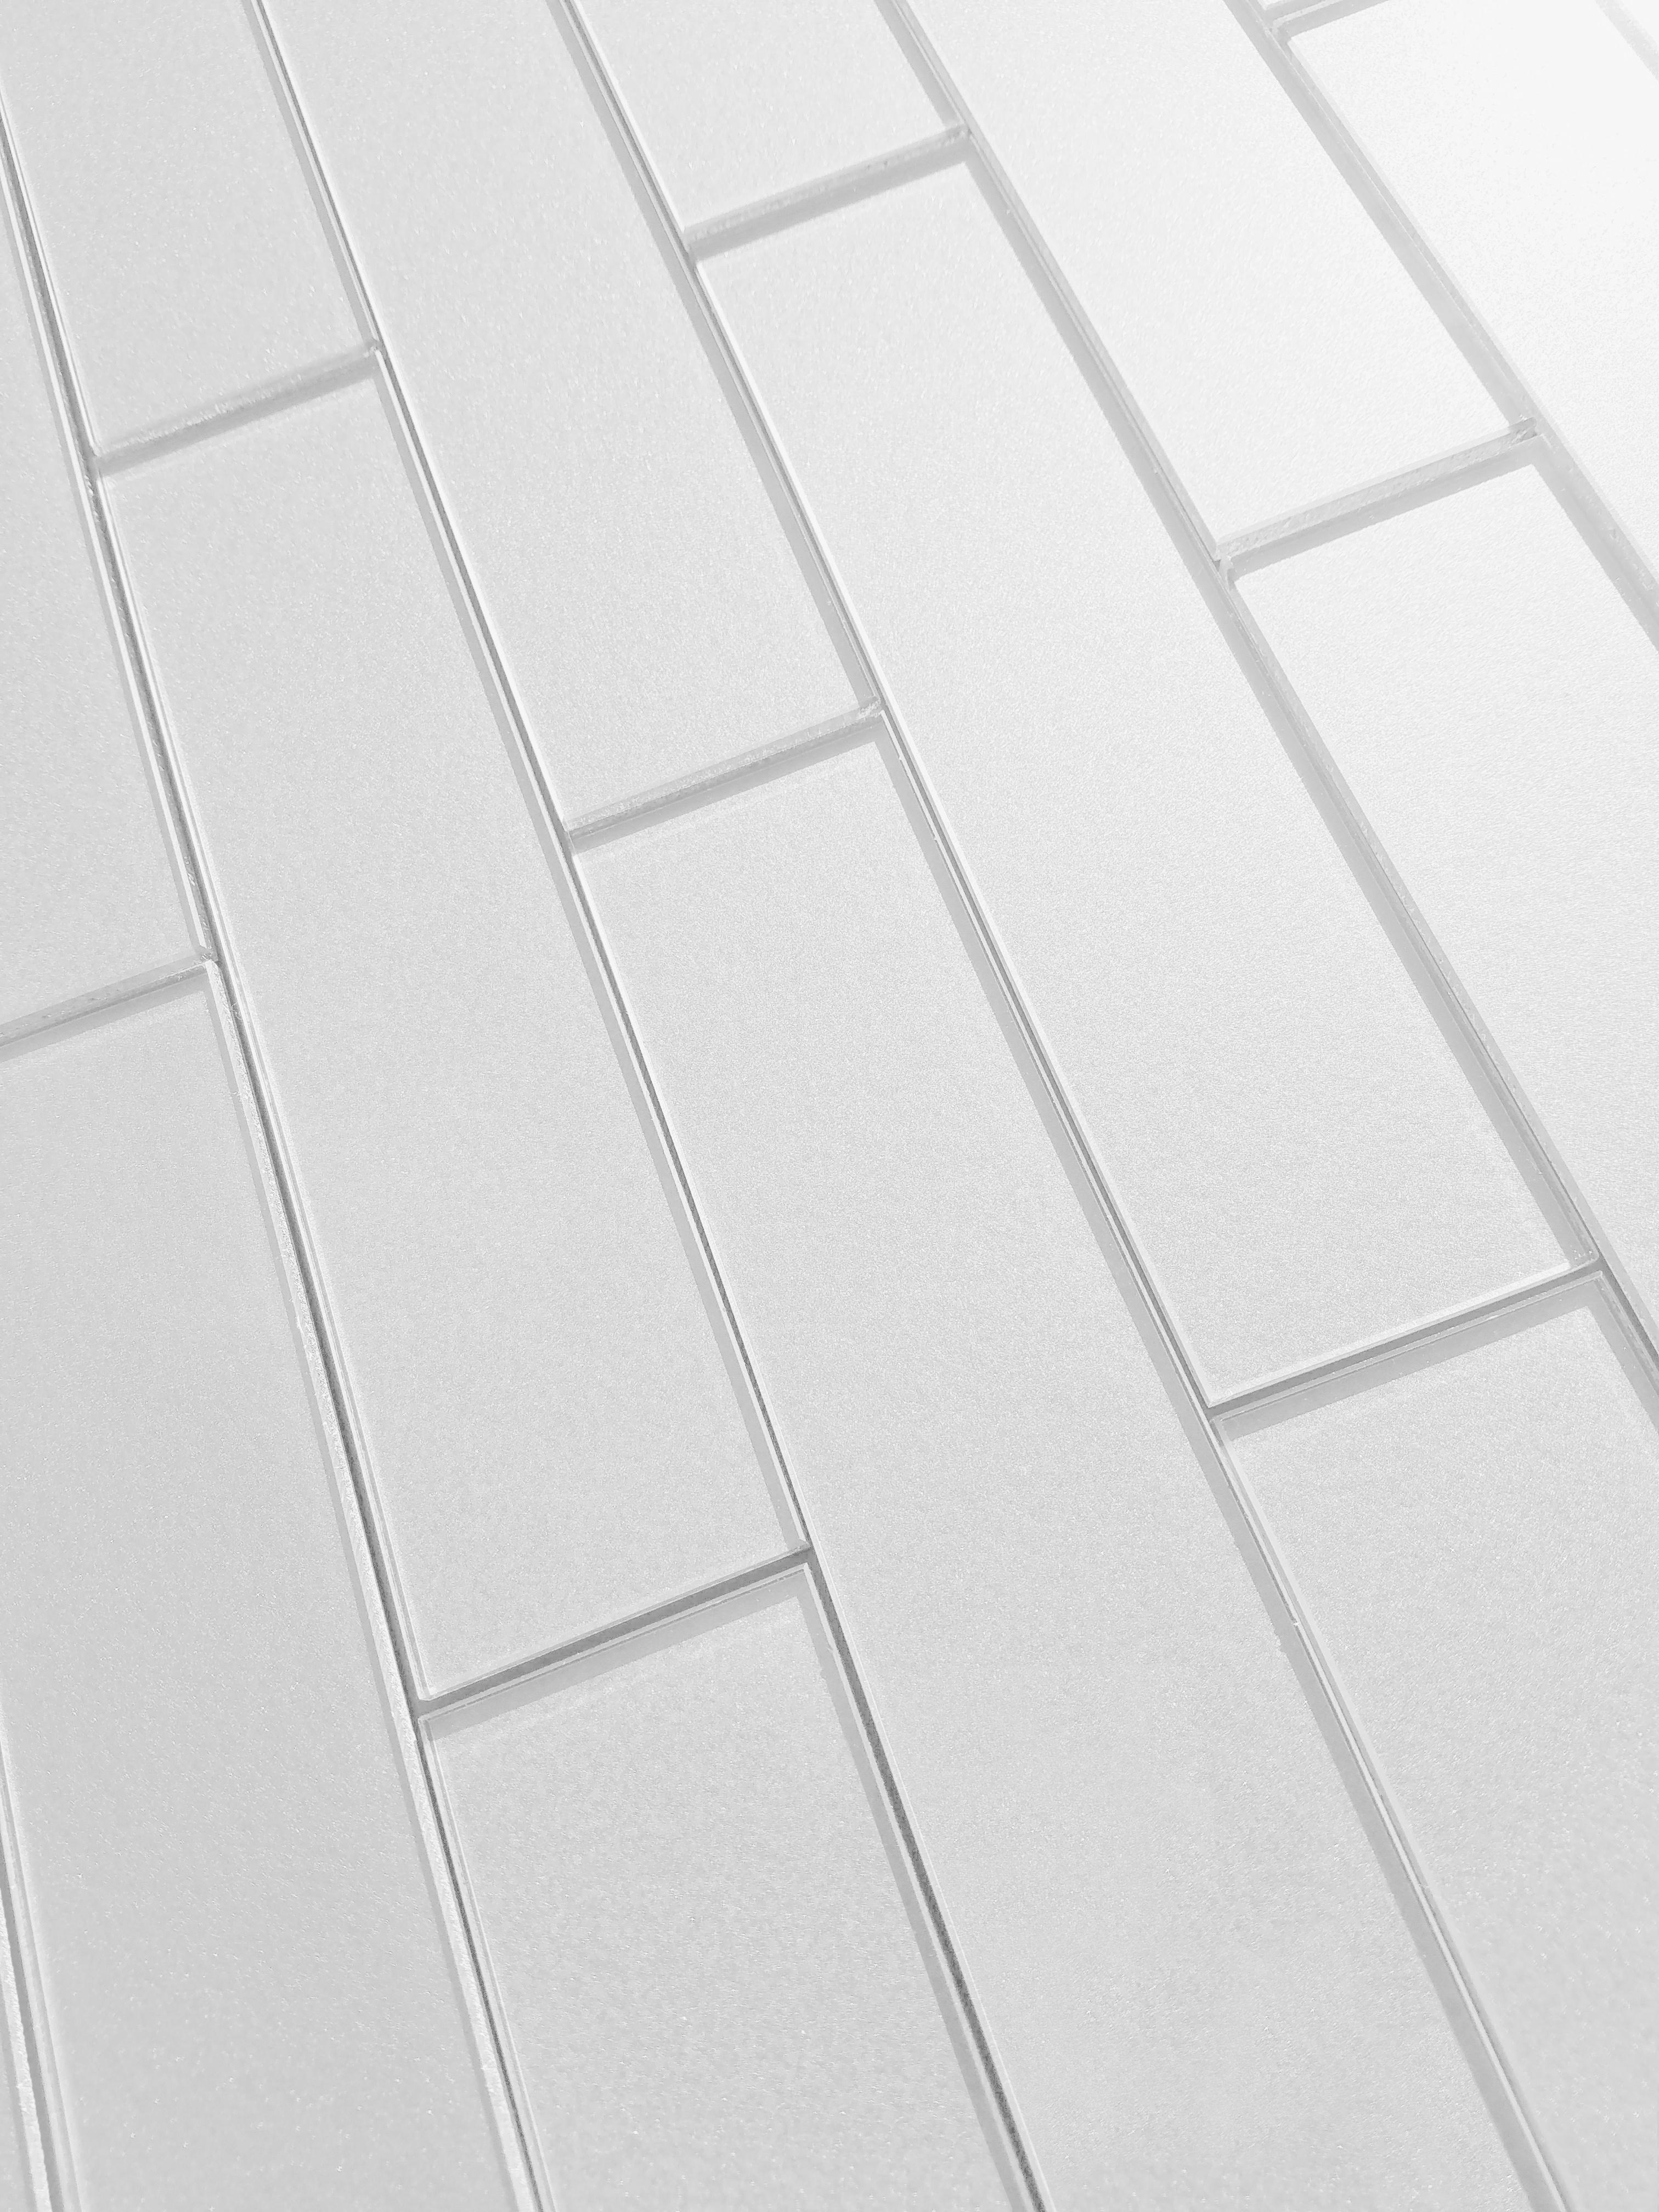 "Forever 2"" x 8"" Glossy Straight White Glass Loose Backsplash Wall Tile"